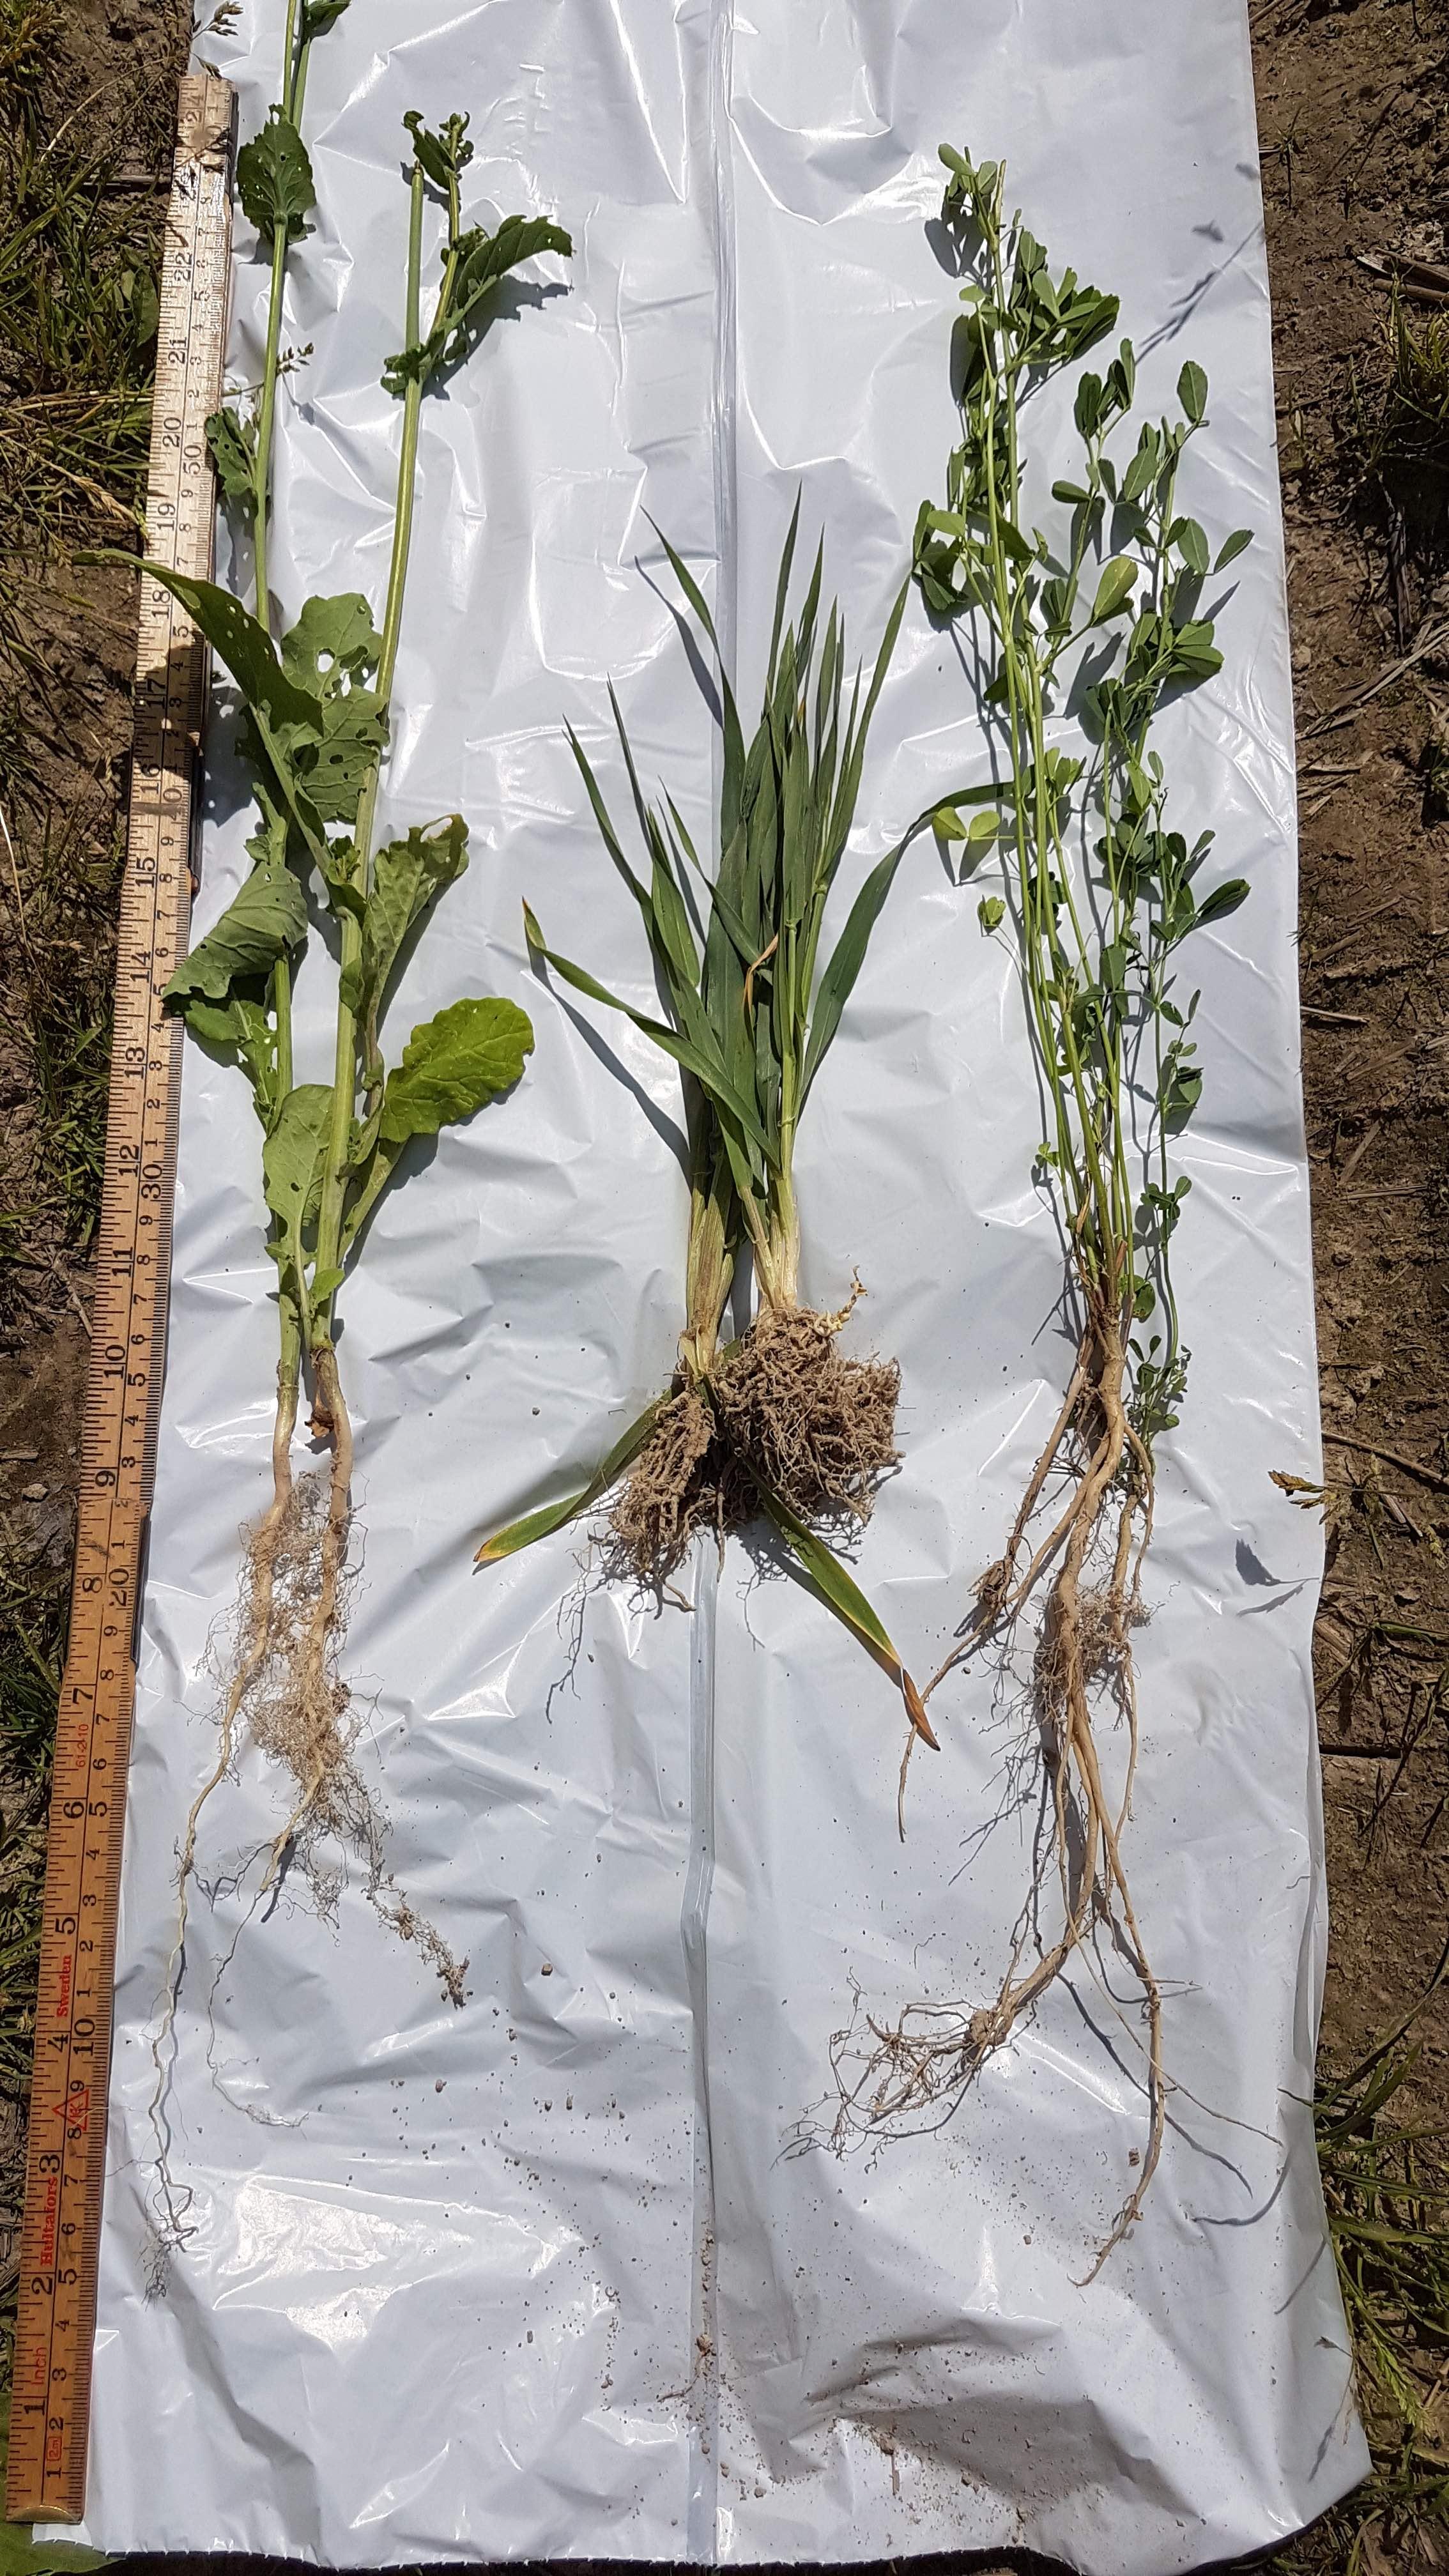 Plantenbak SoilCare Solør T. Seehusen